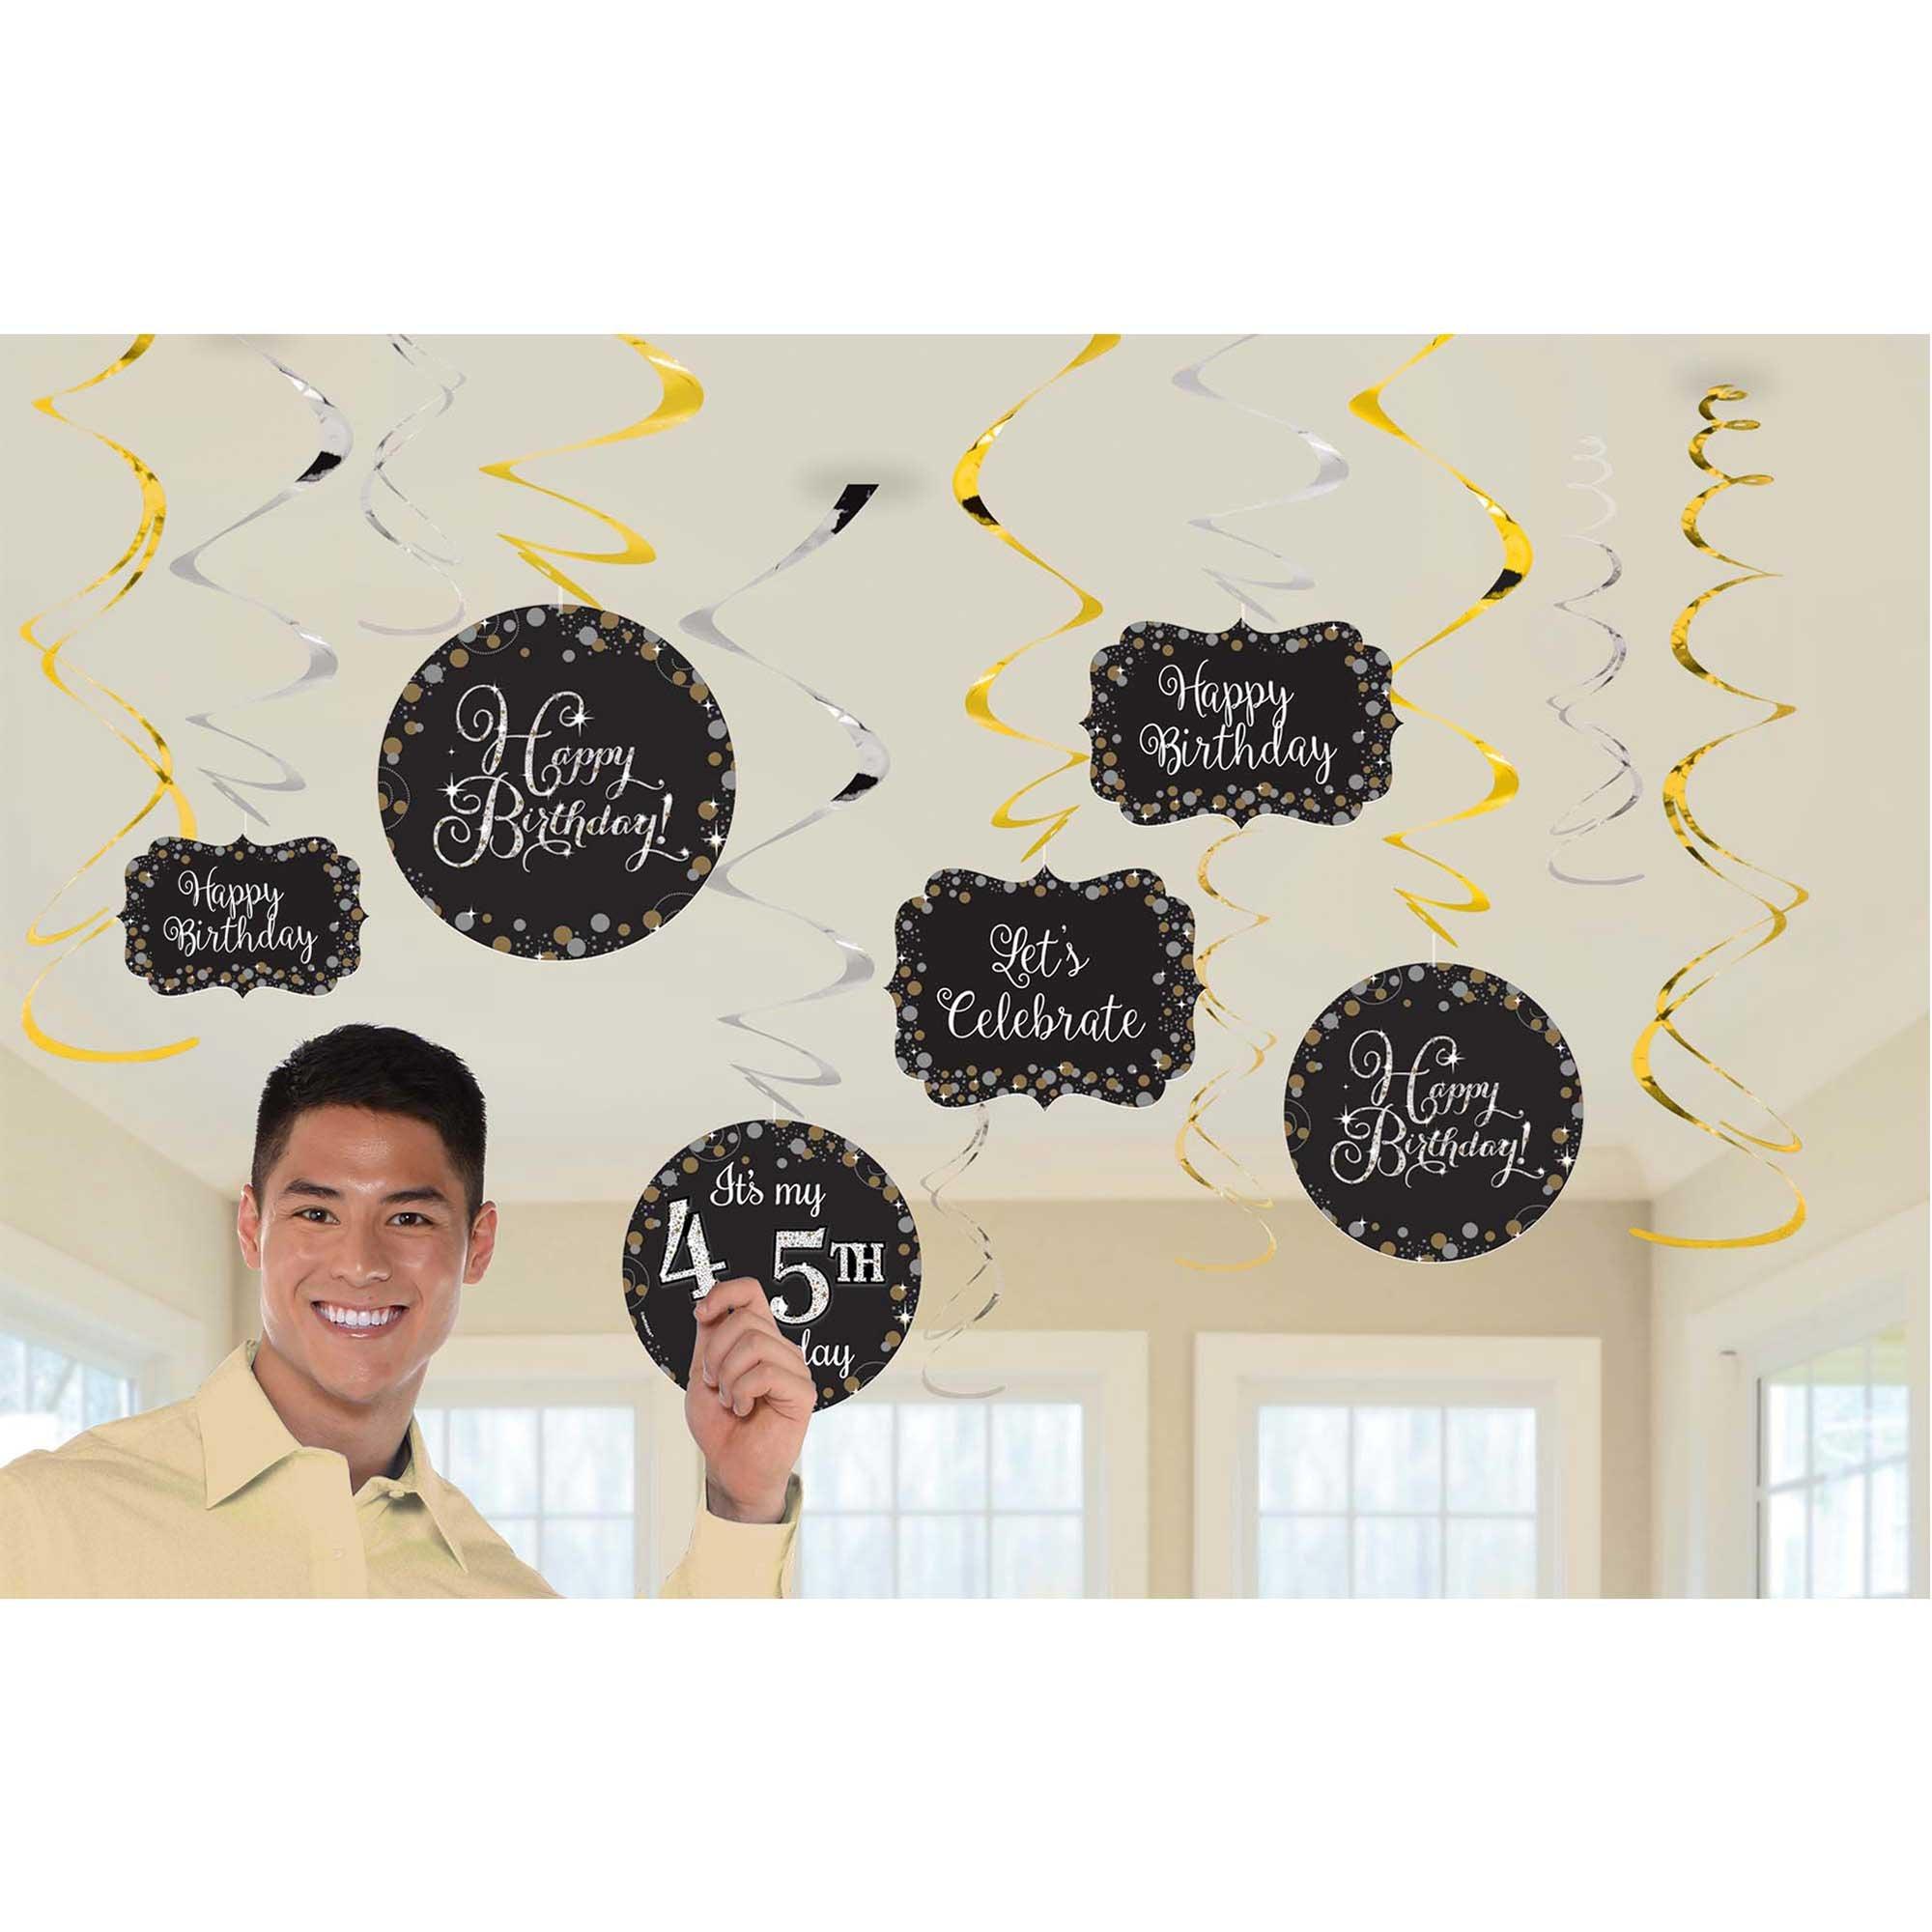 Sparkling Celebration Add Any Age Hanging Swirl Decorations